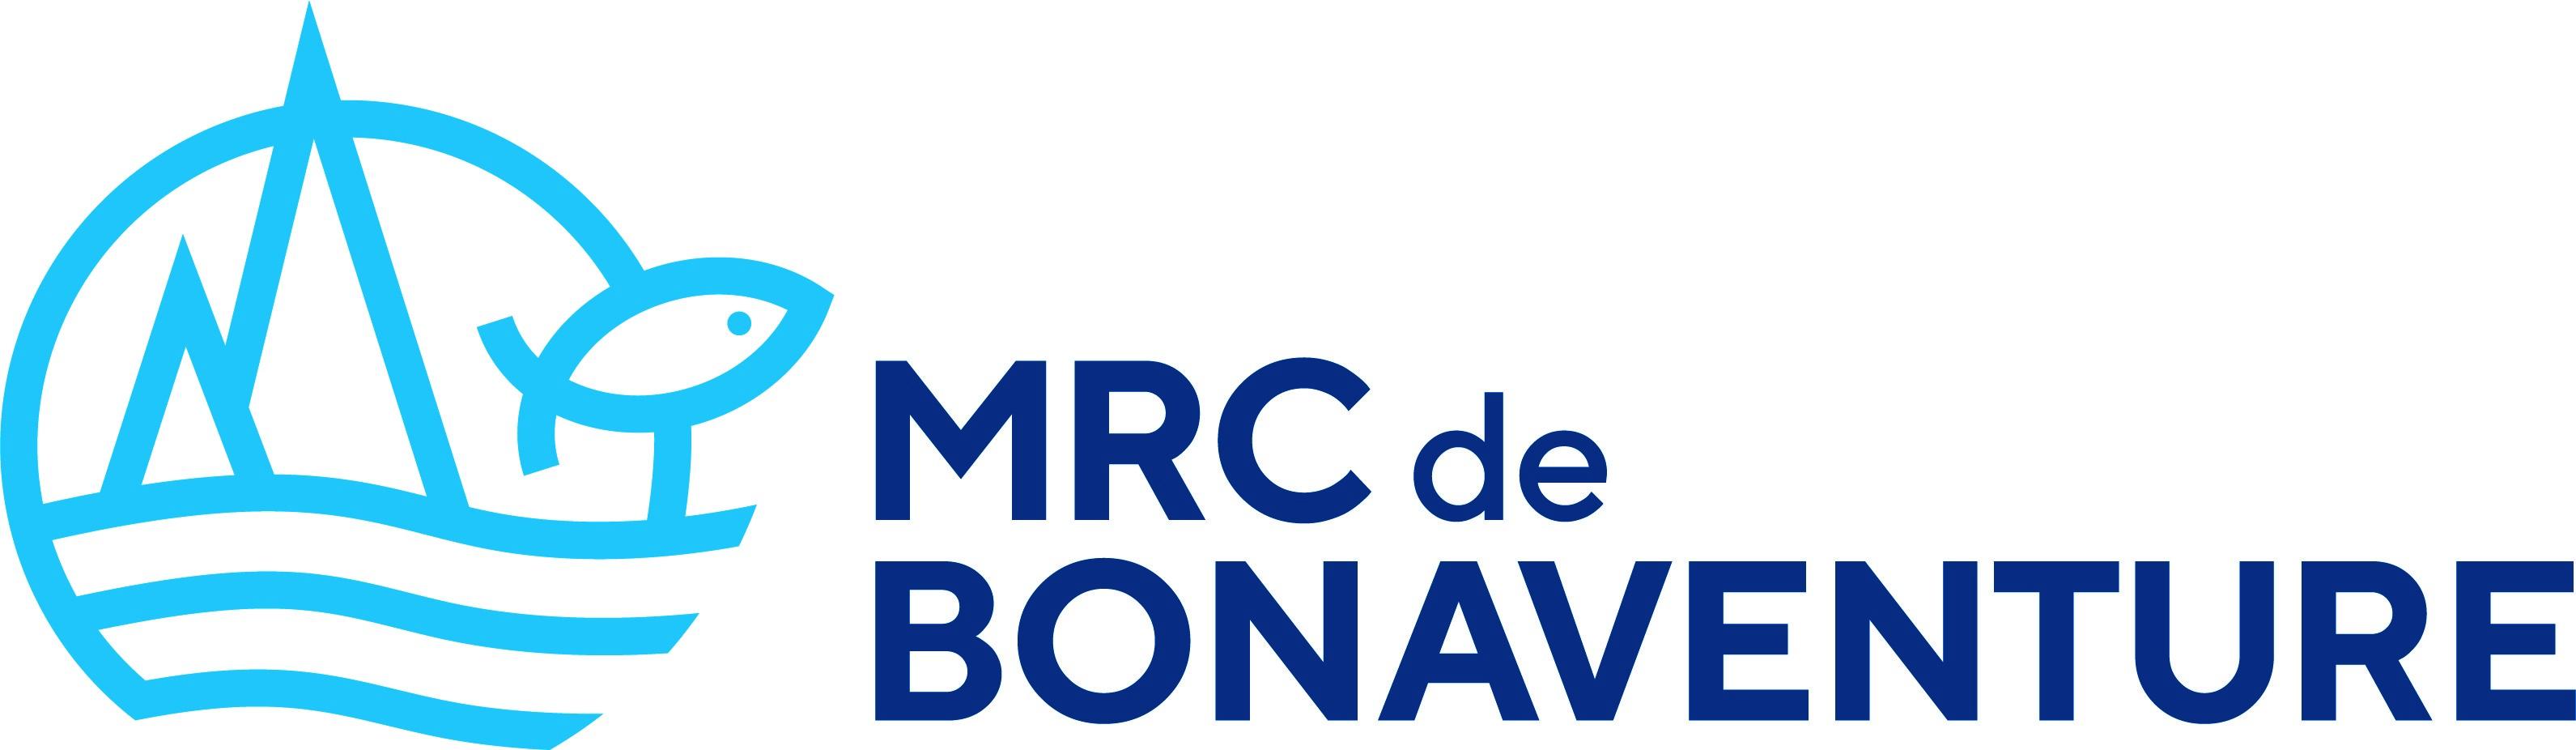 logo_mrc_bonaventure_2018